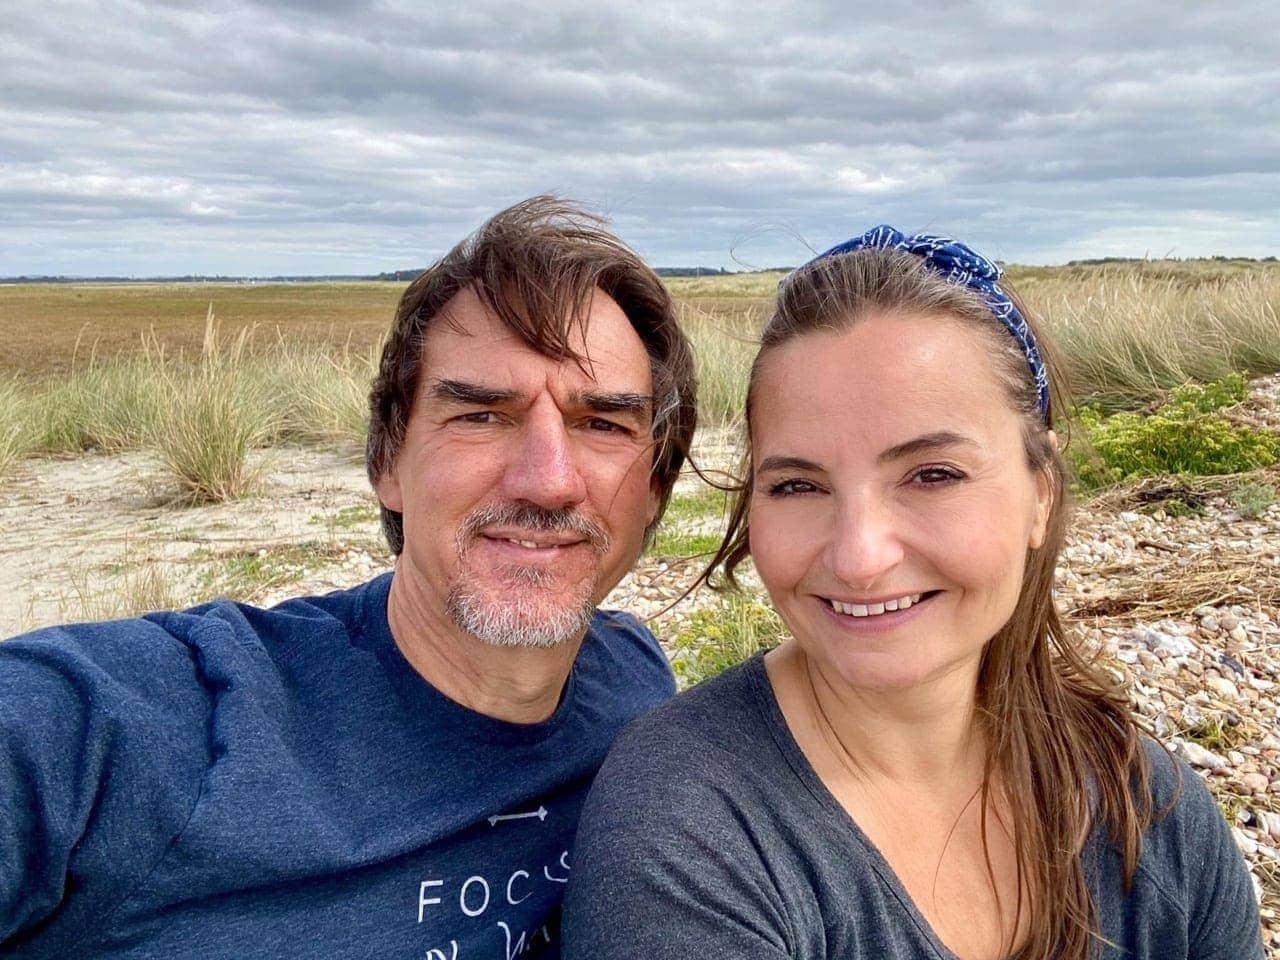 Carol & Paul Tansley - Selfie on the beach